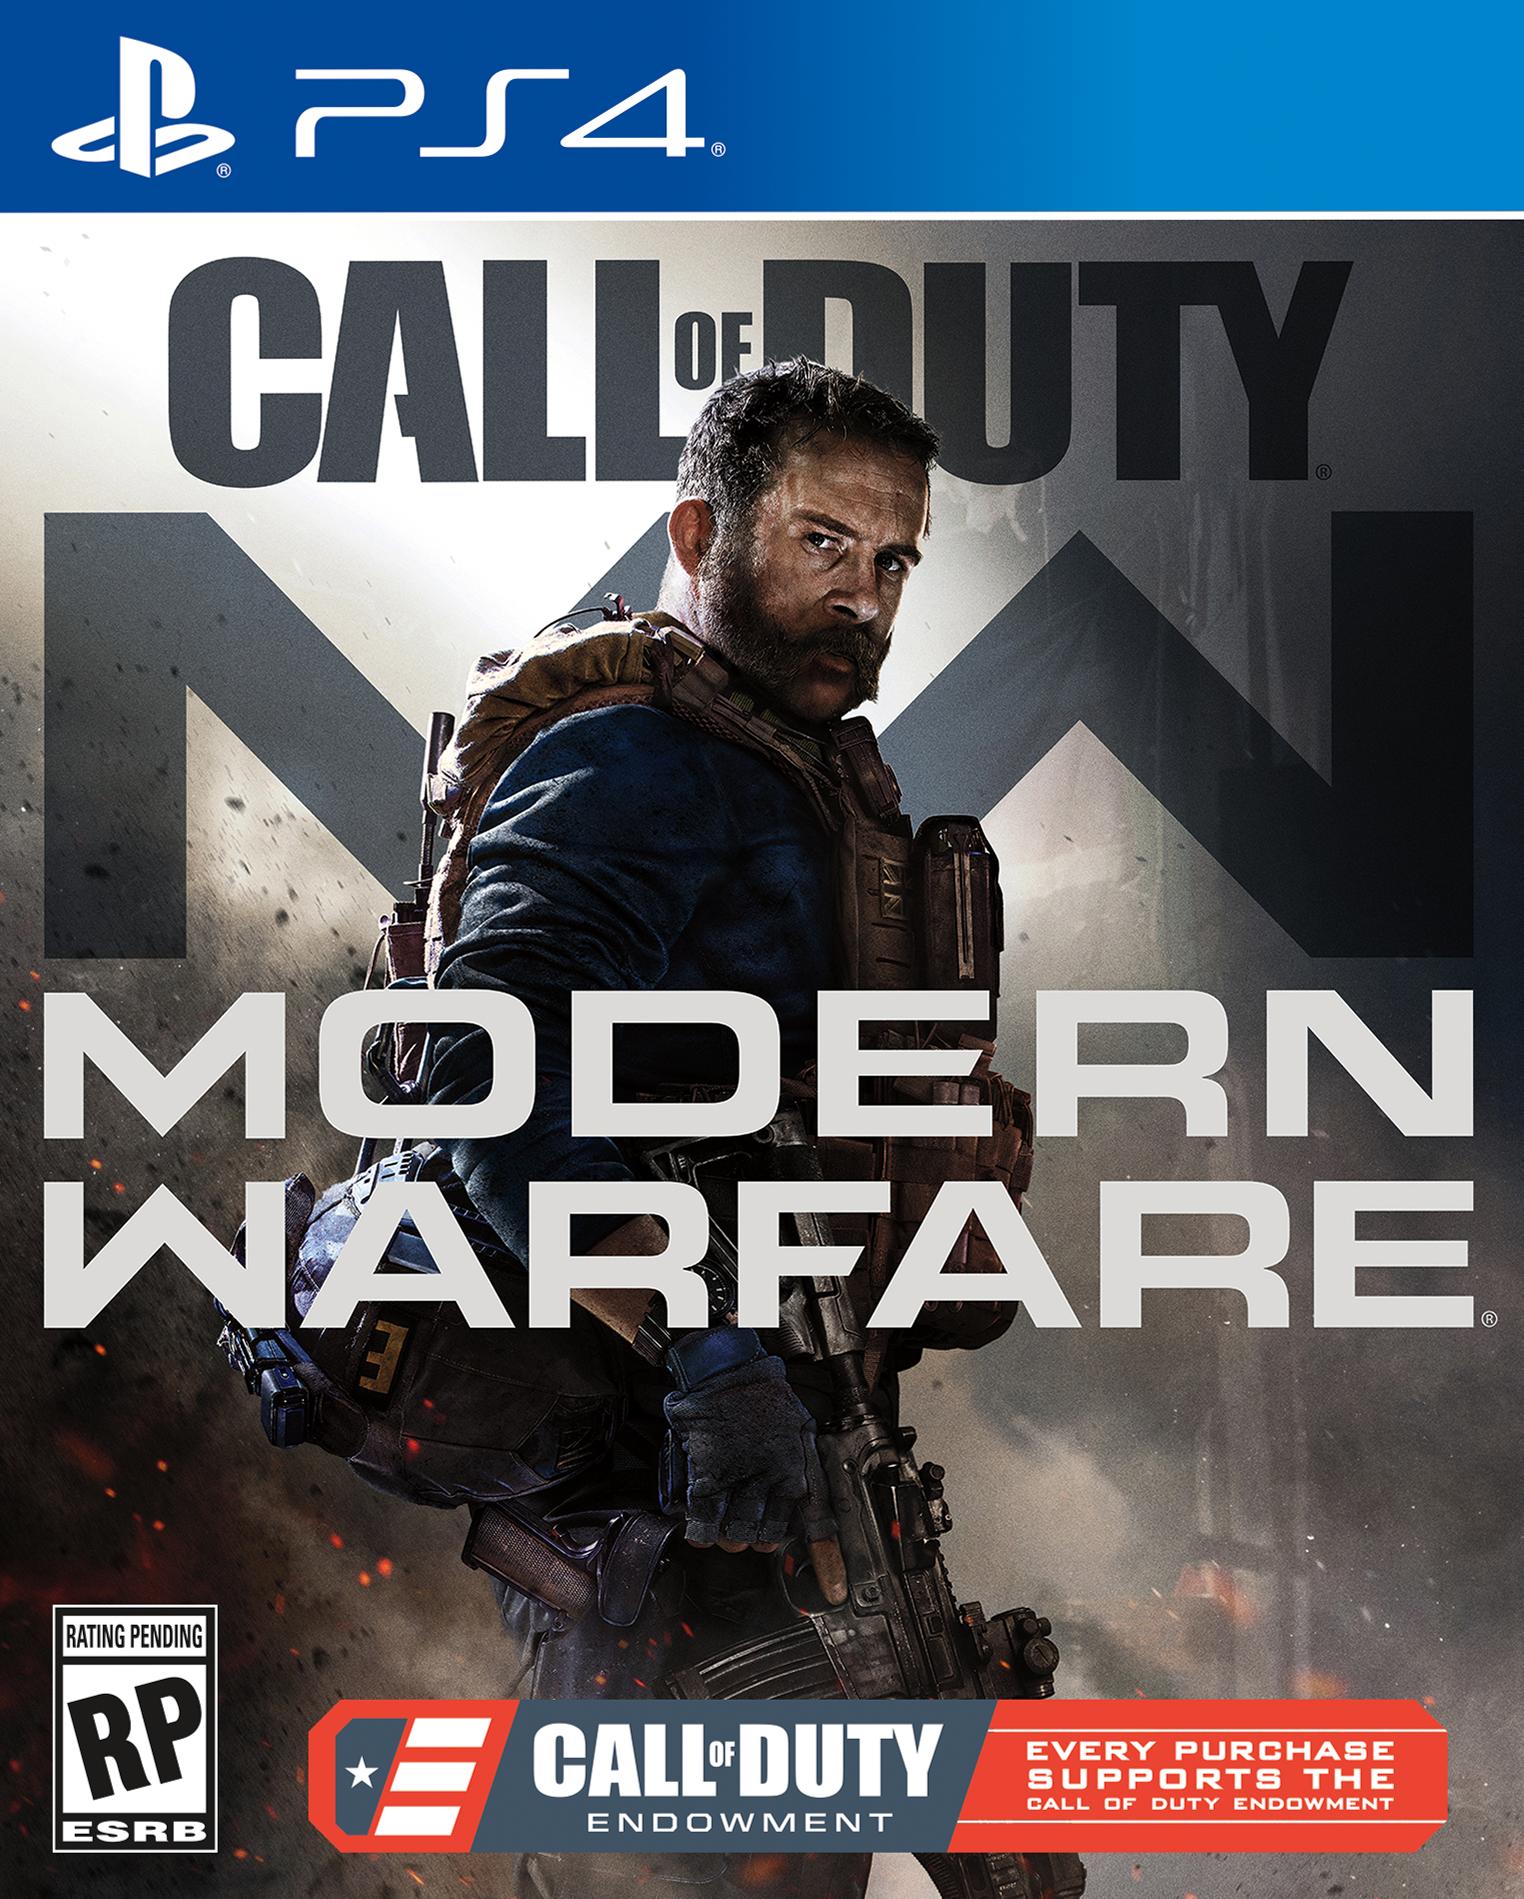 Call Of Duty Modern Warfare Season 5 Kicks Off August 5th